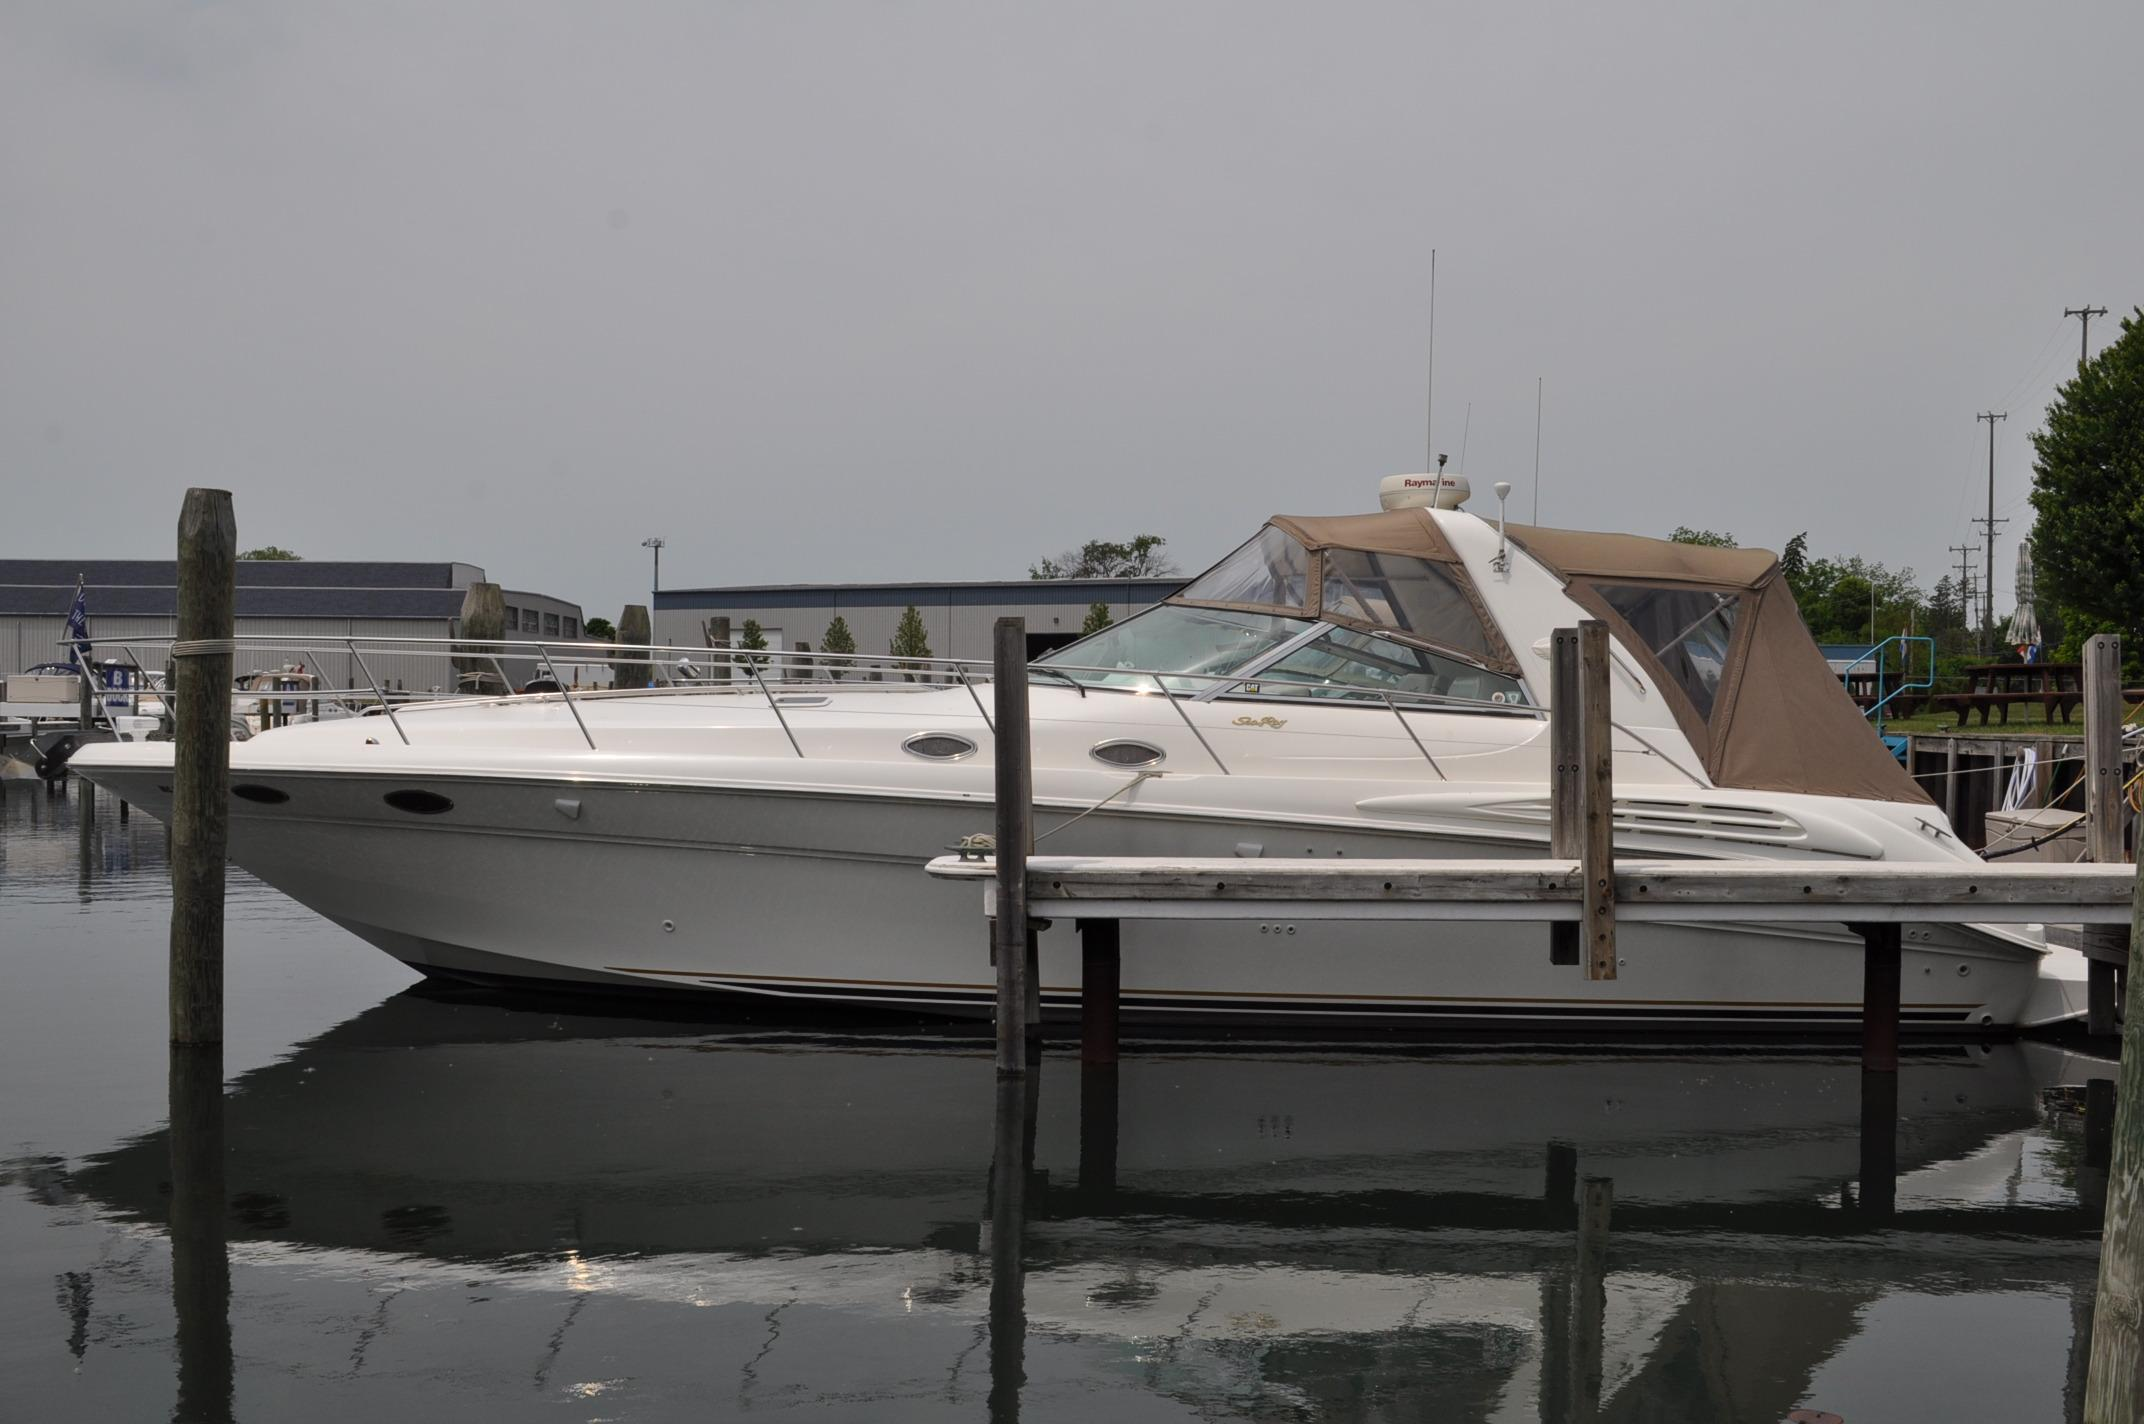 40 ft 1997 sea ray 400 sundancer (3116 cat diesel)